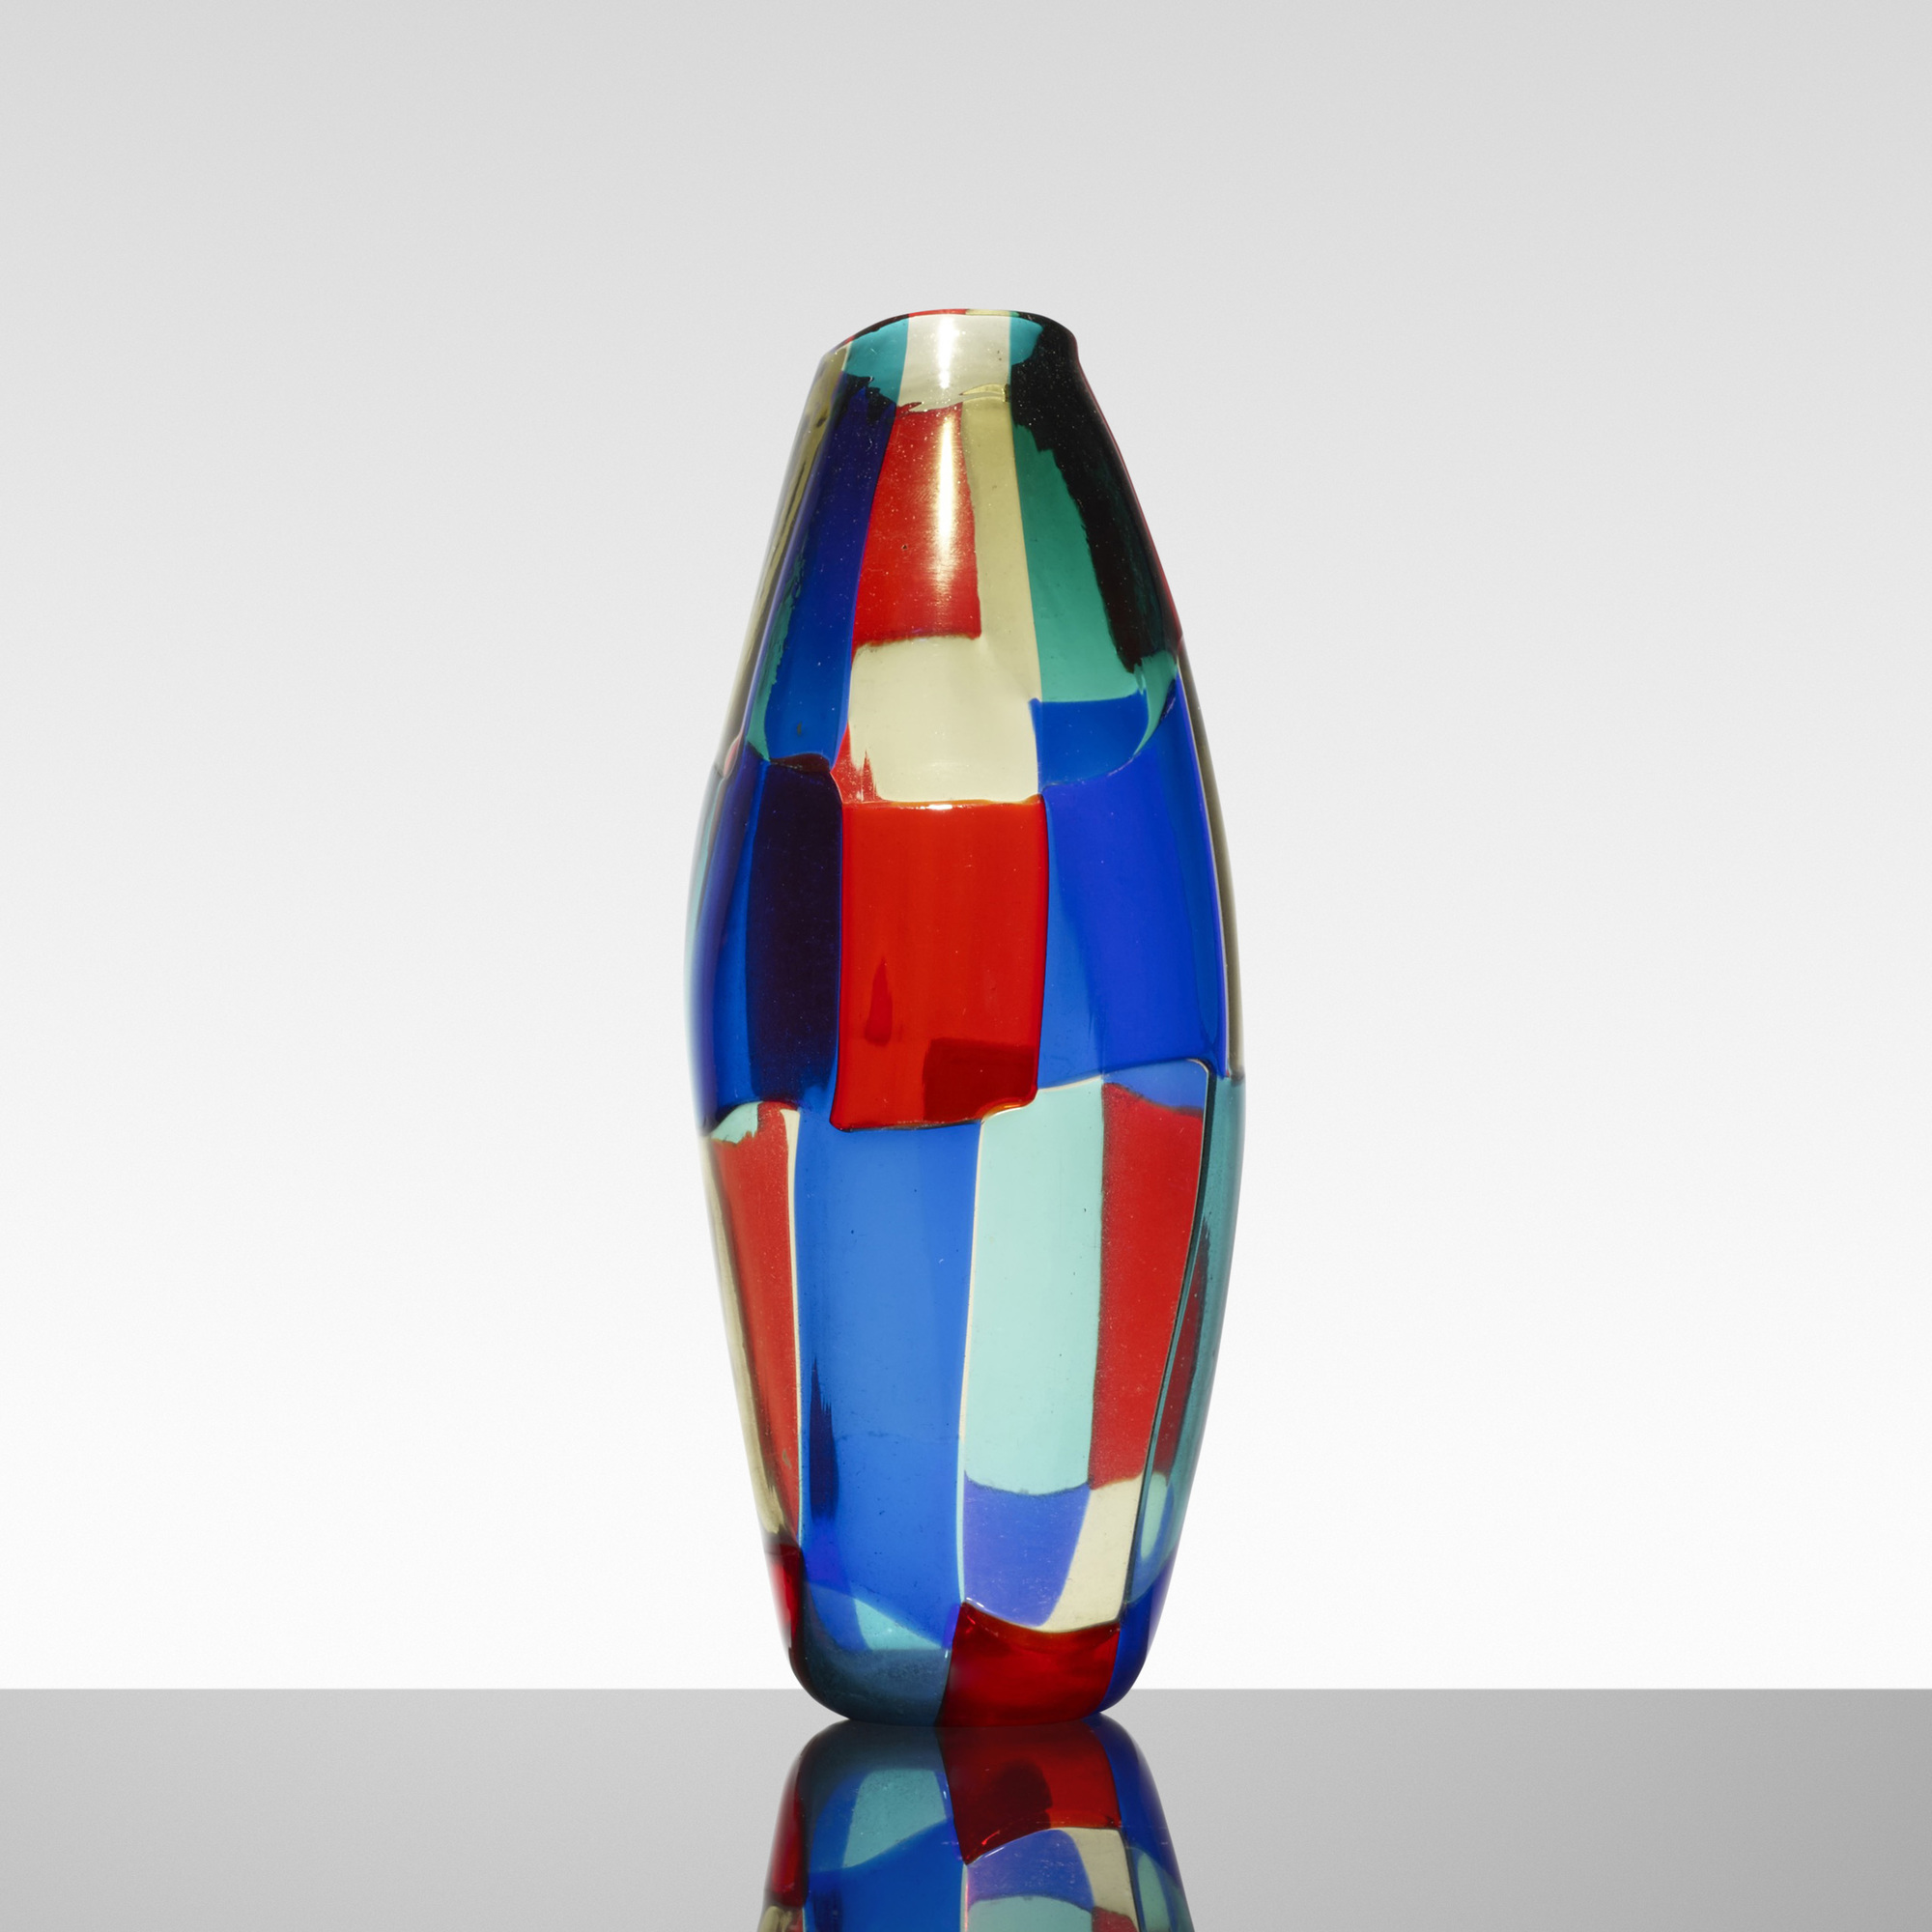 140: Fulvio Bianconi / rare Pezzato vase (2 of 3)